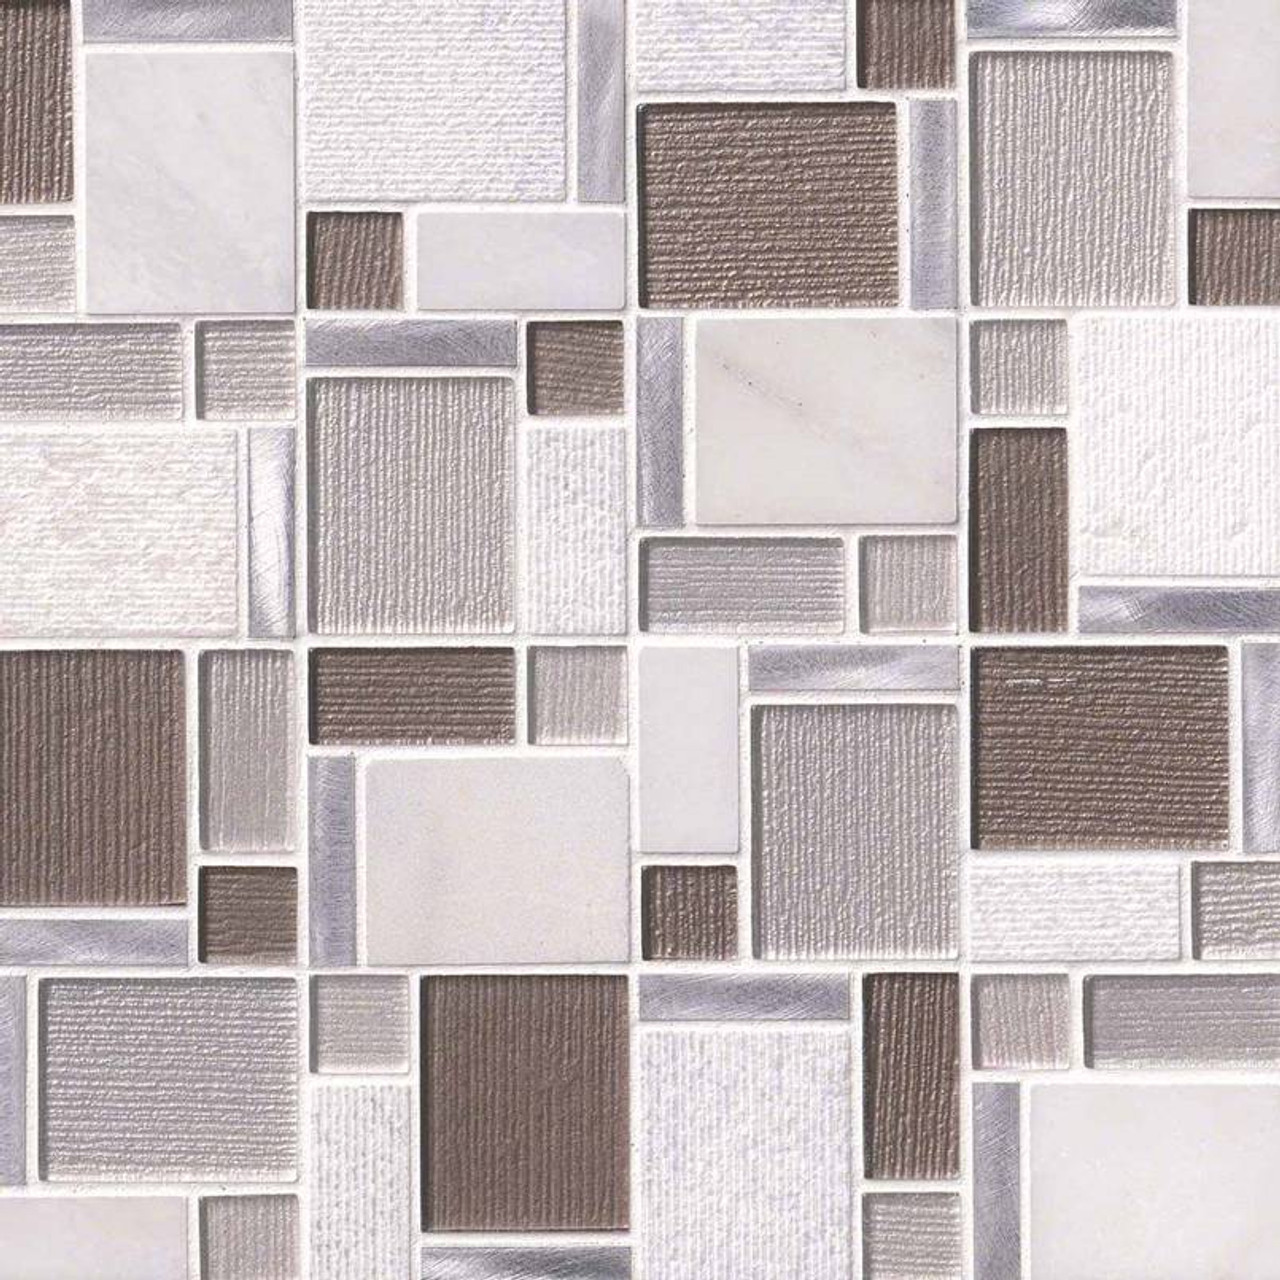 magica pattern mosaic